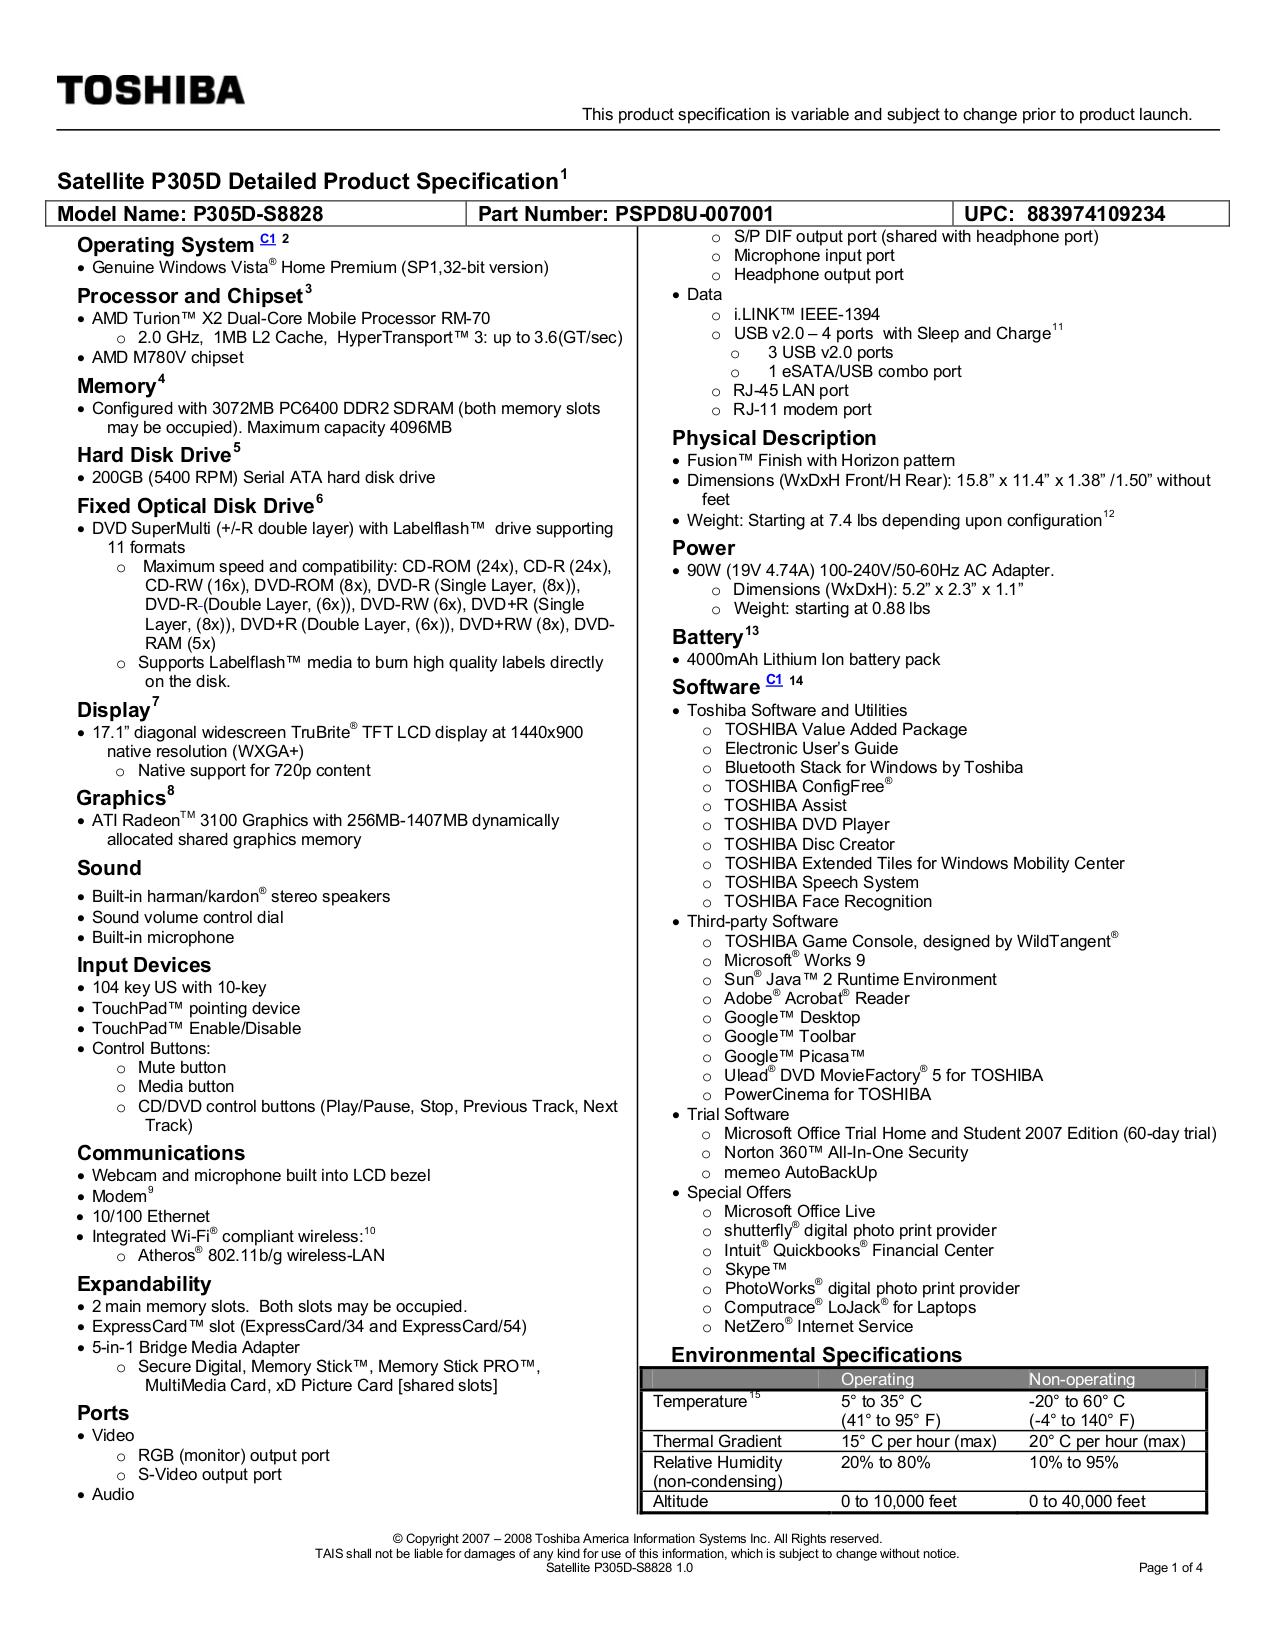 download free pdf for toshiba satellite p305d s8828 laptop manual rh umlib com